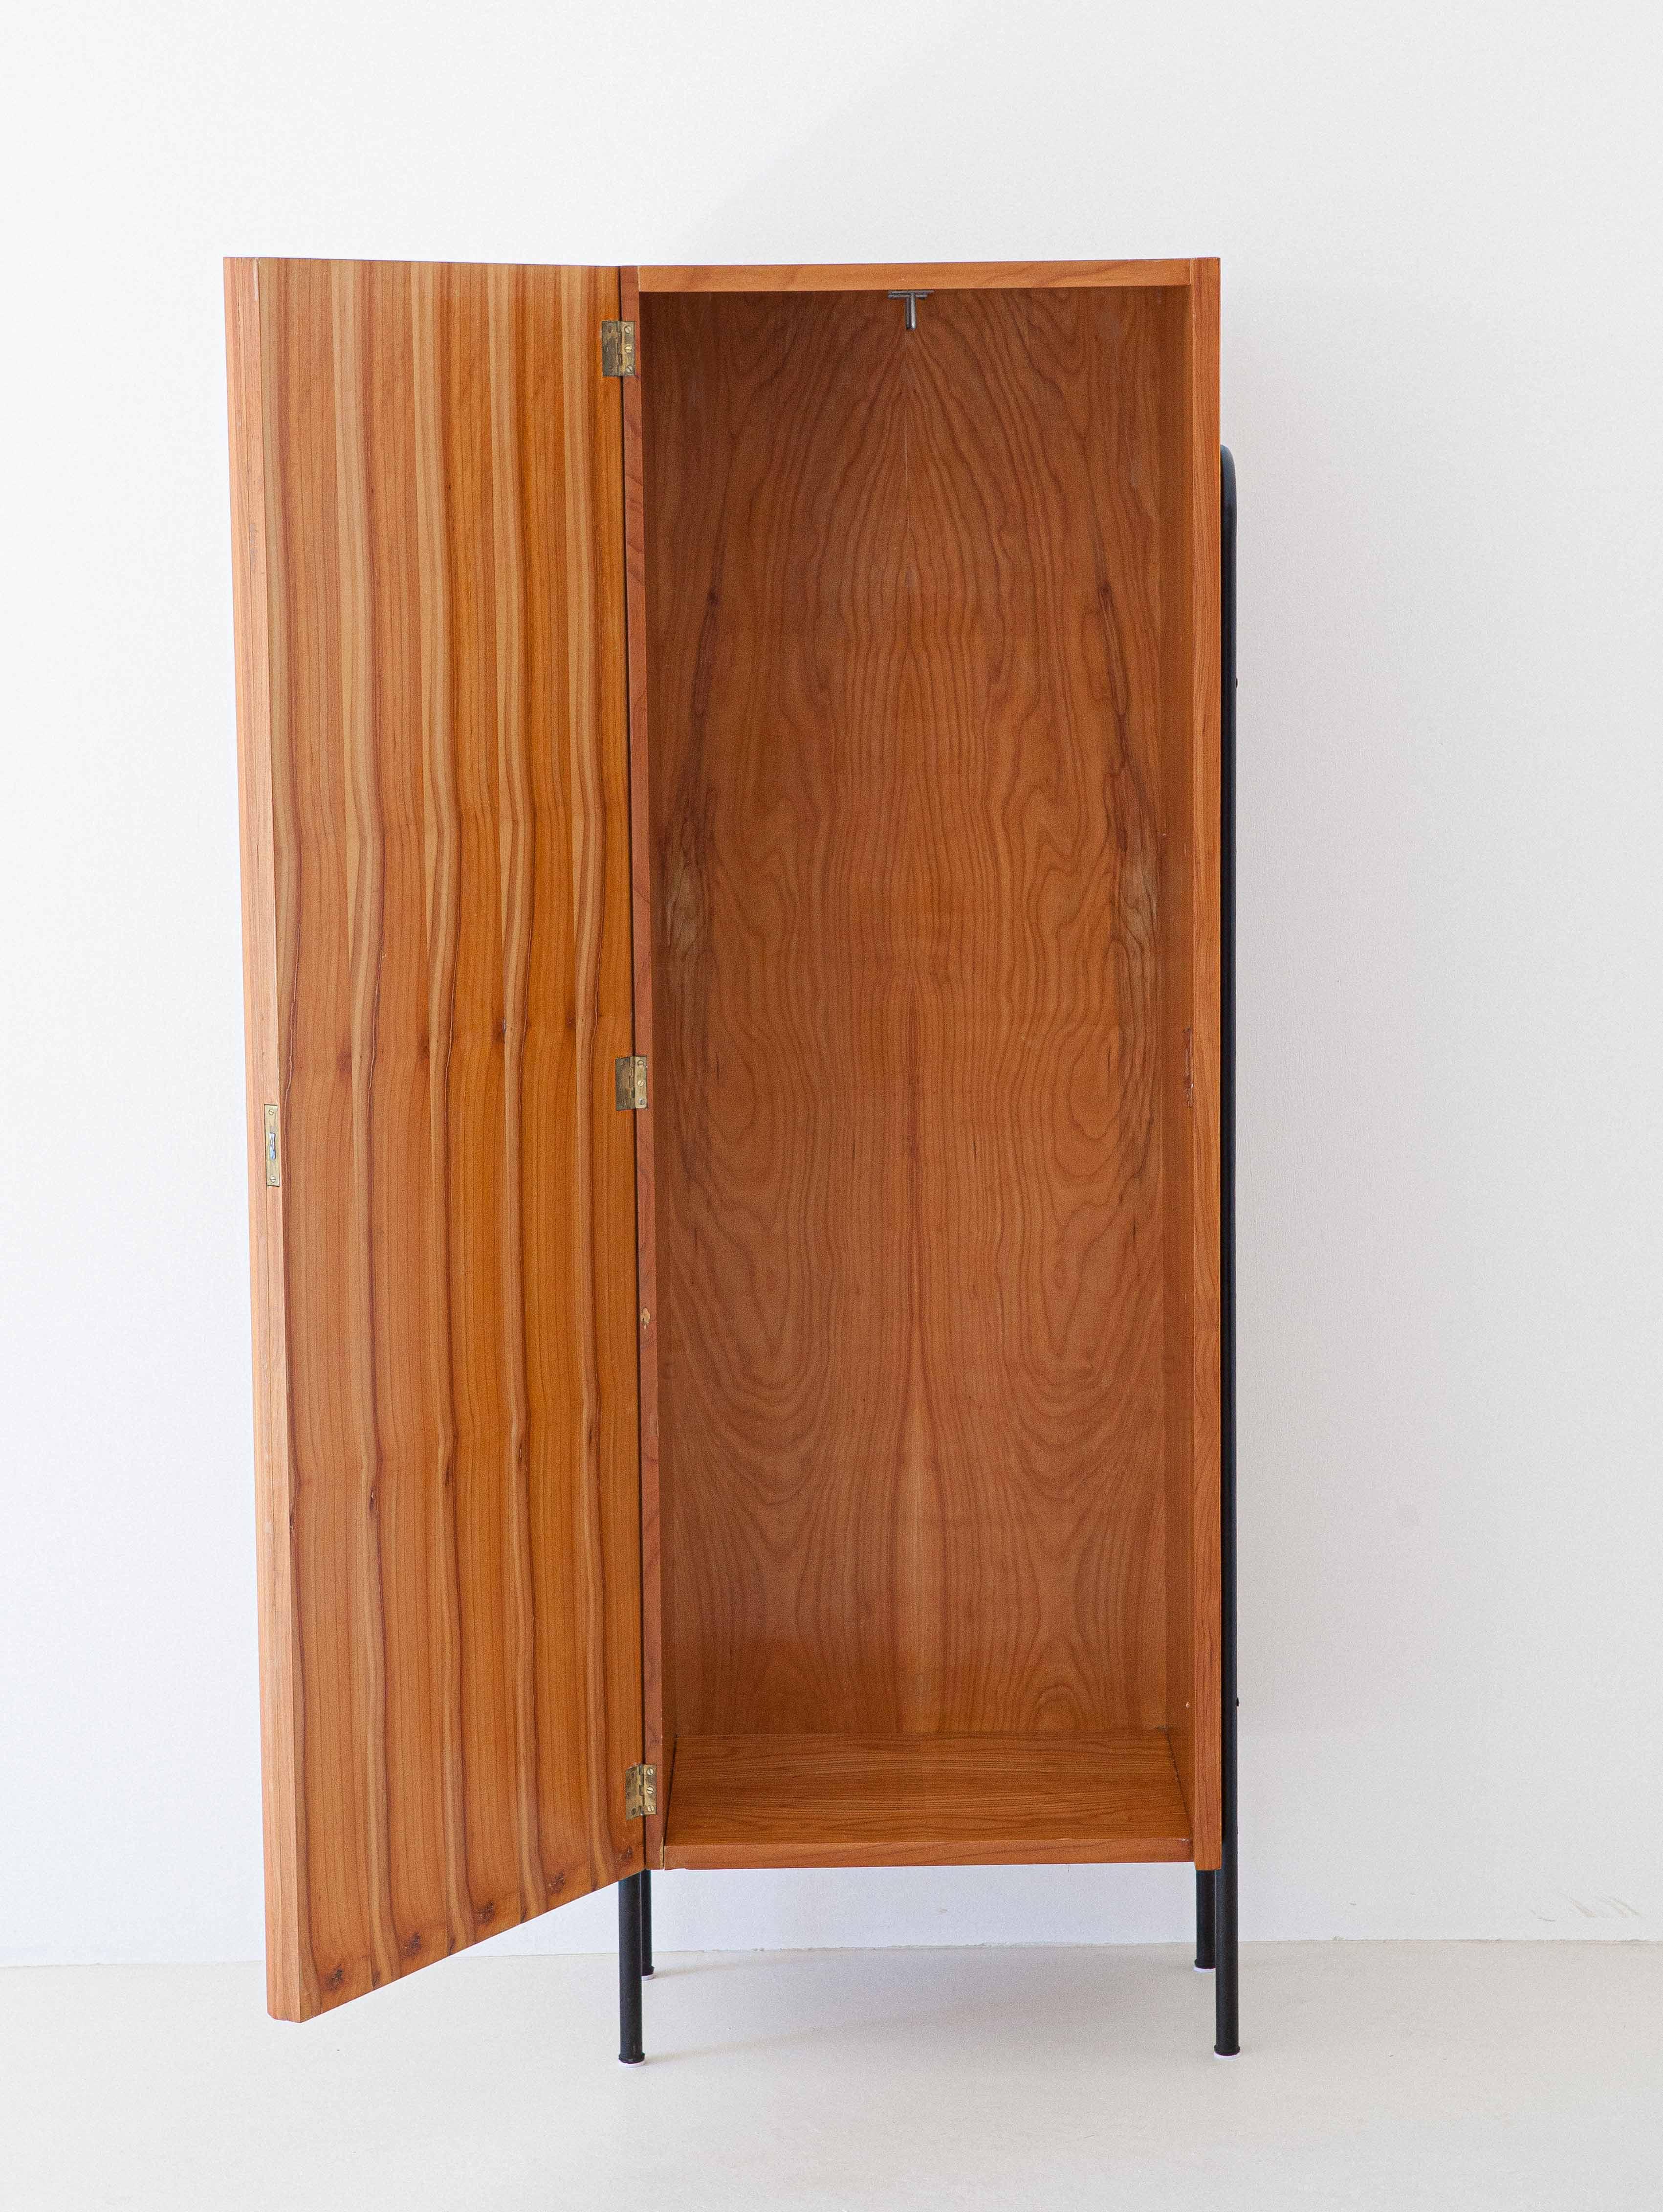 1950s-italian-light-wood-and-iron-wardrobe-cabinet-7-st114